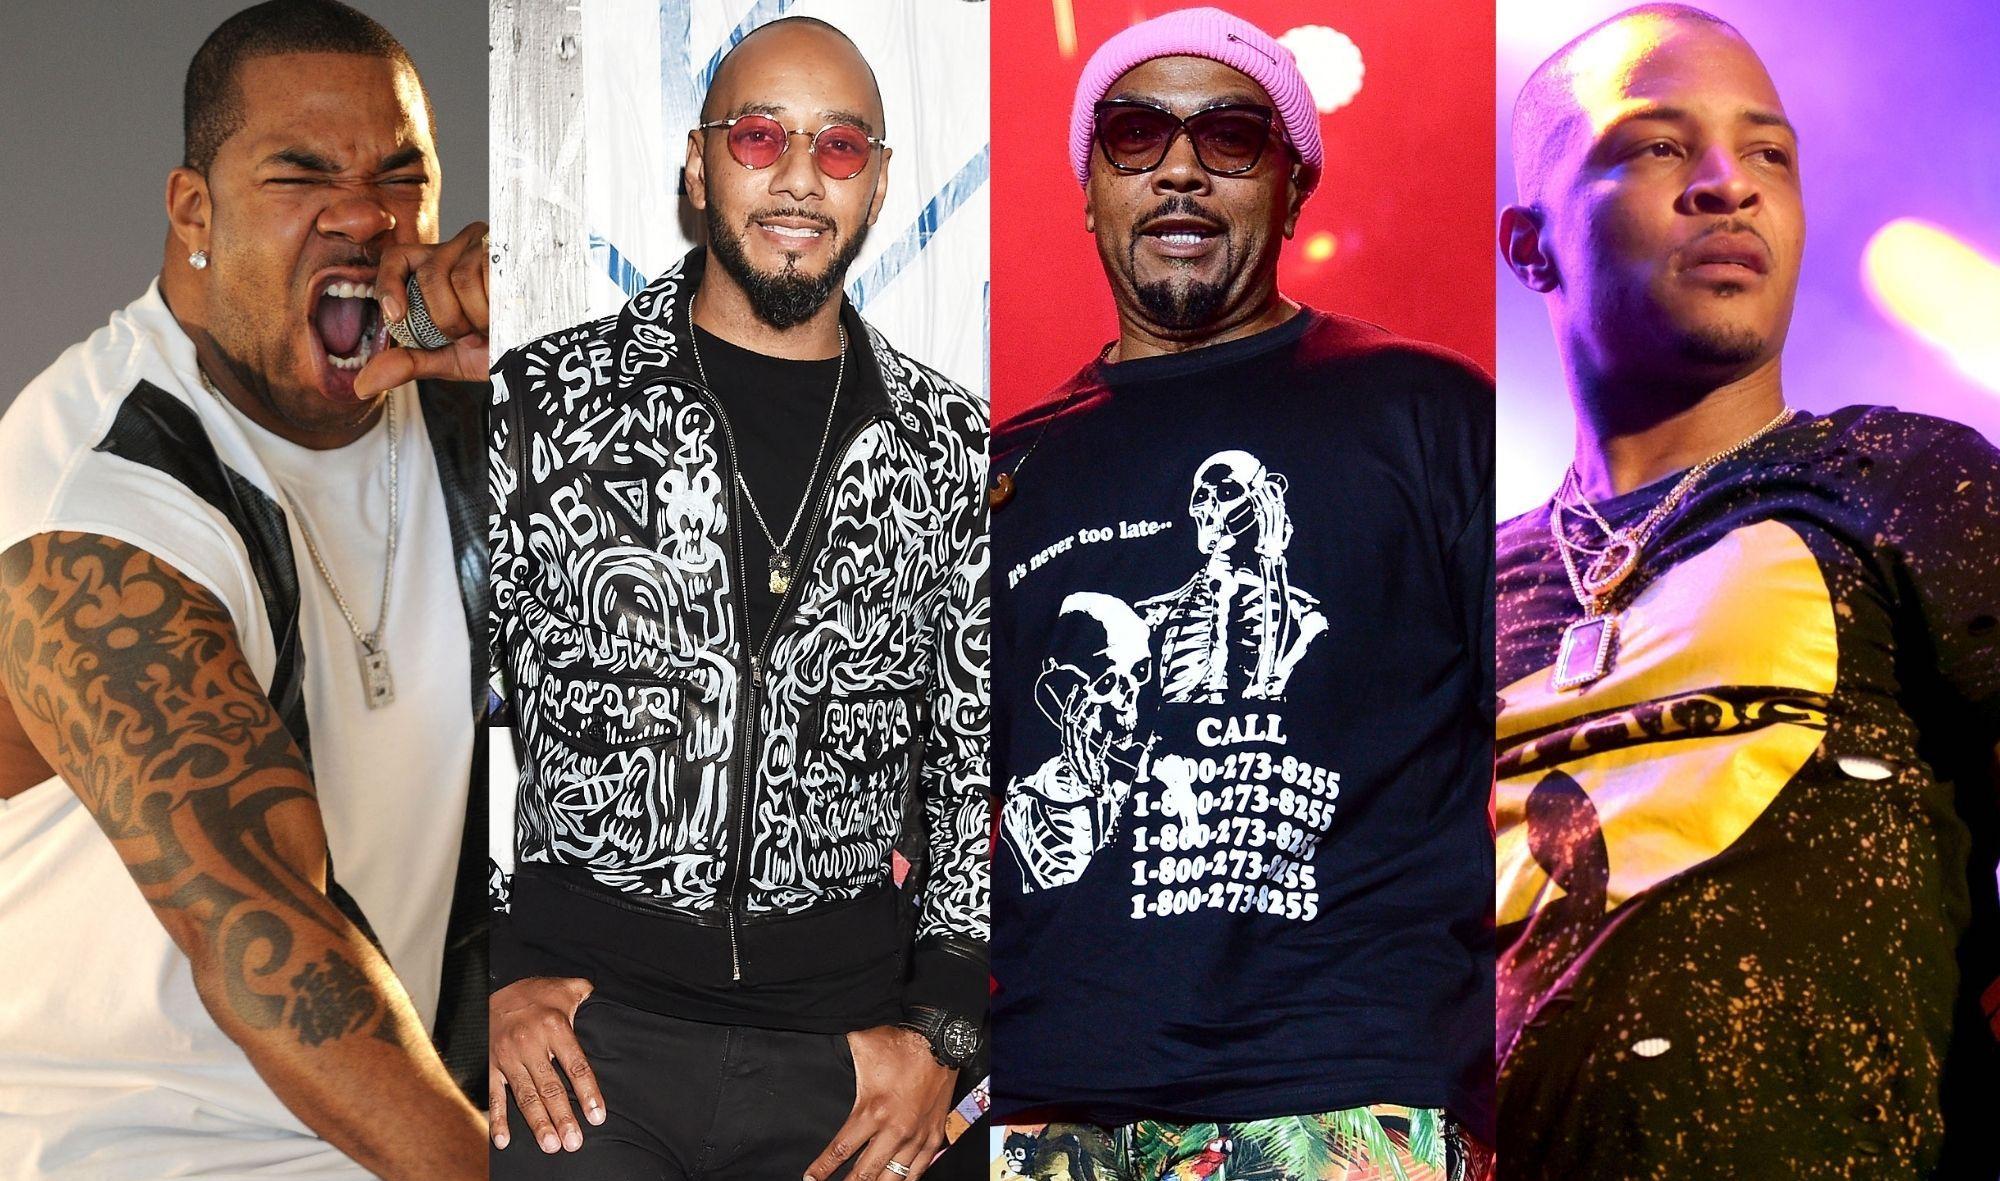 Swizz Beatz, Timbaland, Busta Rhymes, T.I.